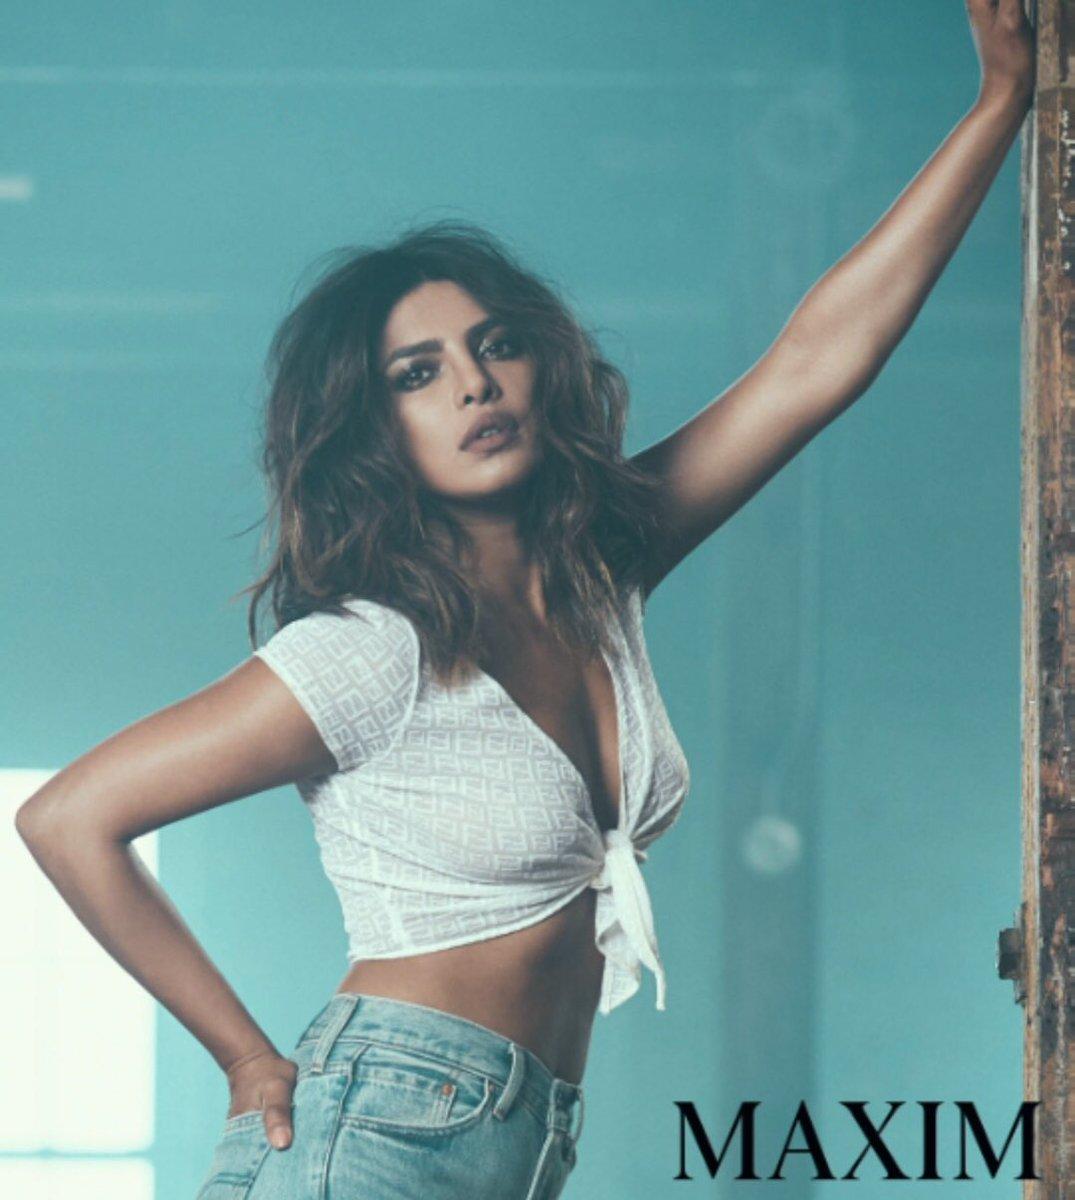 priyanka chopra maxim india hottest cleavage photoshoot southcolors 1